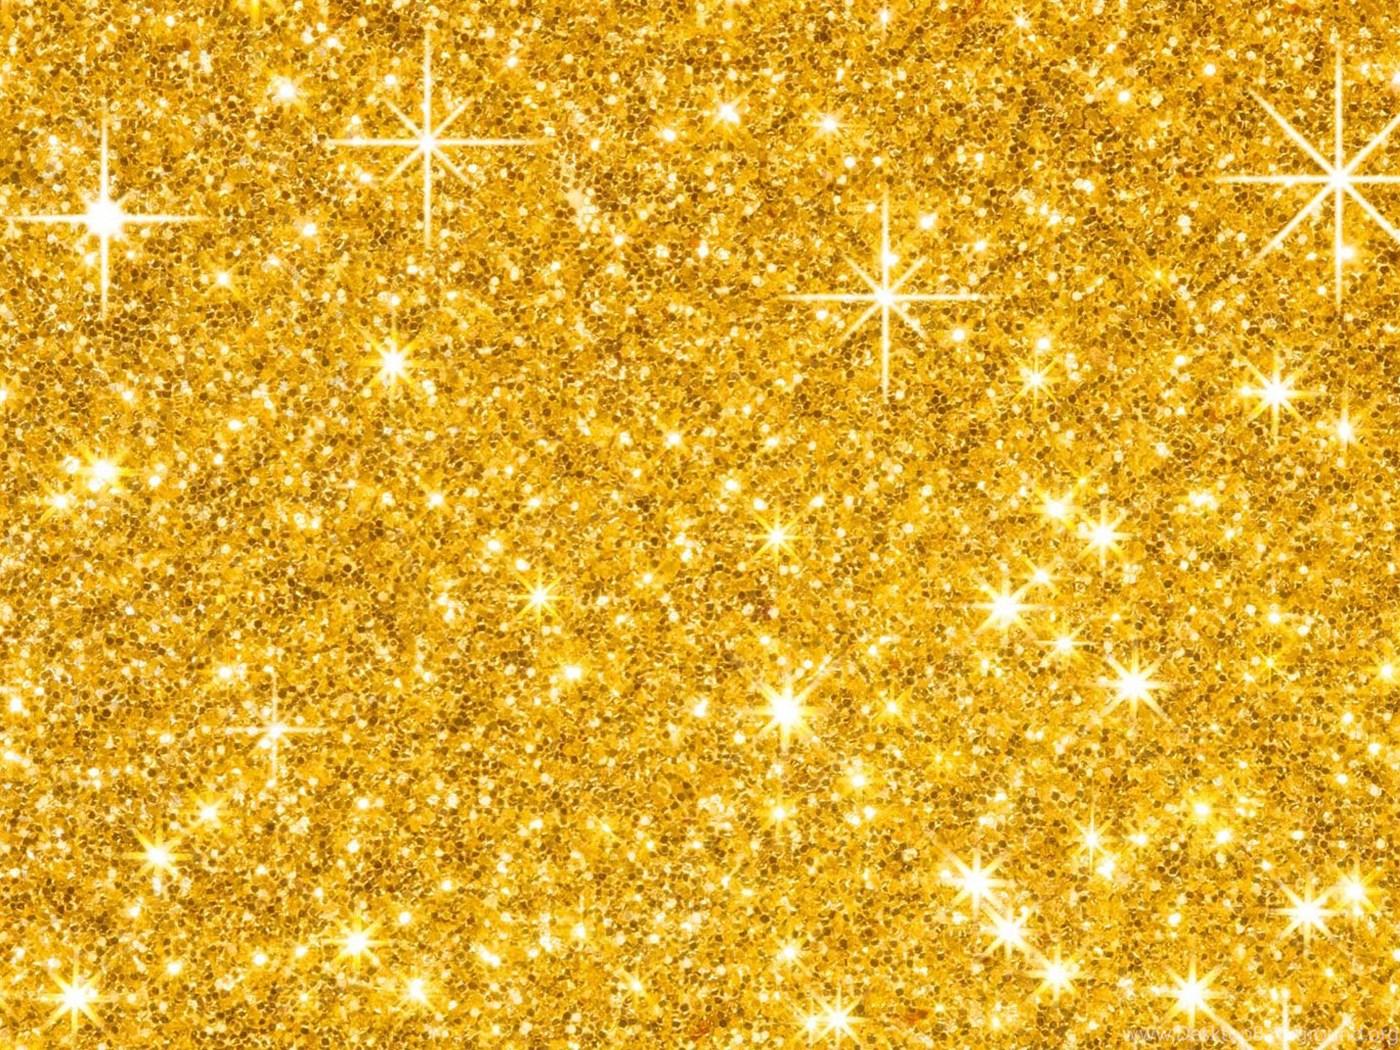 Dorados Image: High Resolution Gold Glitter Wallpapers For Desktop Full